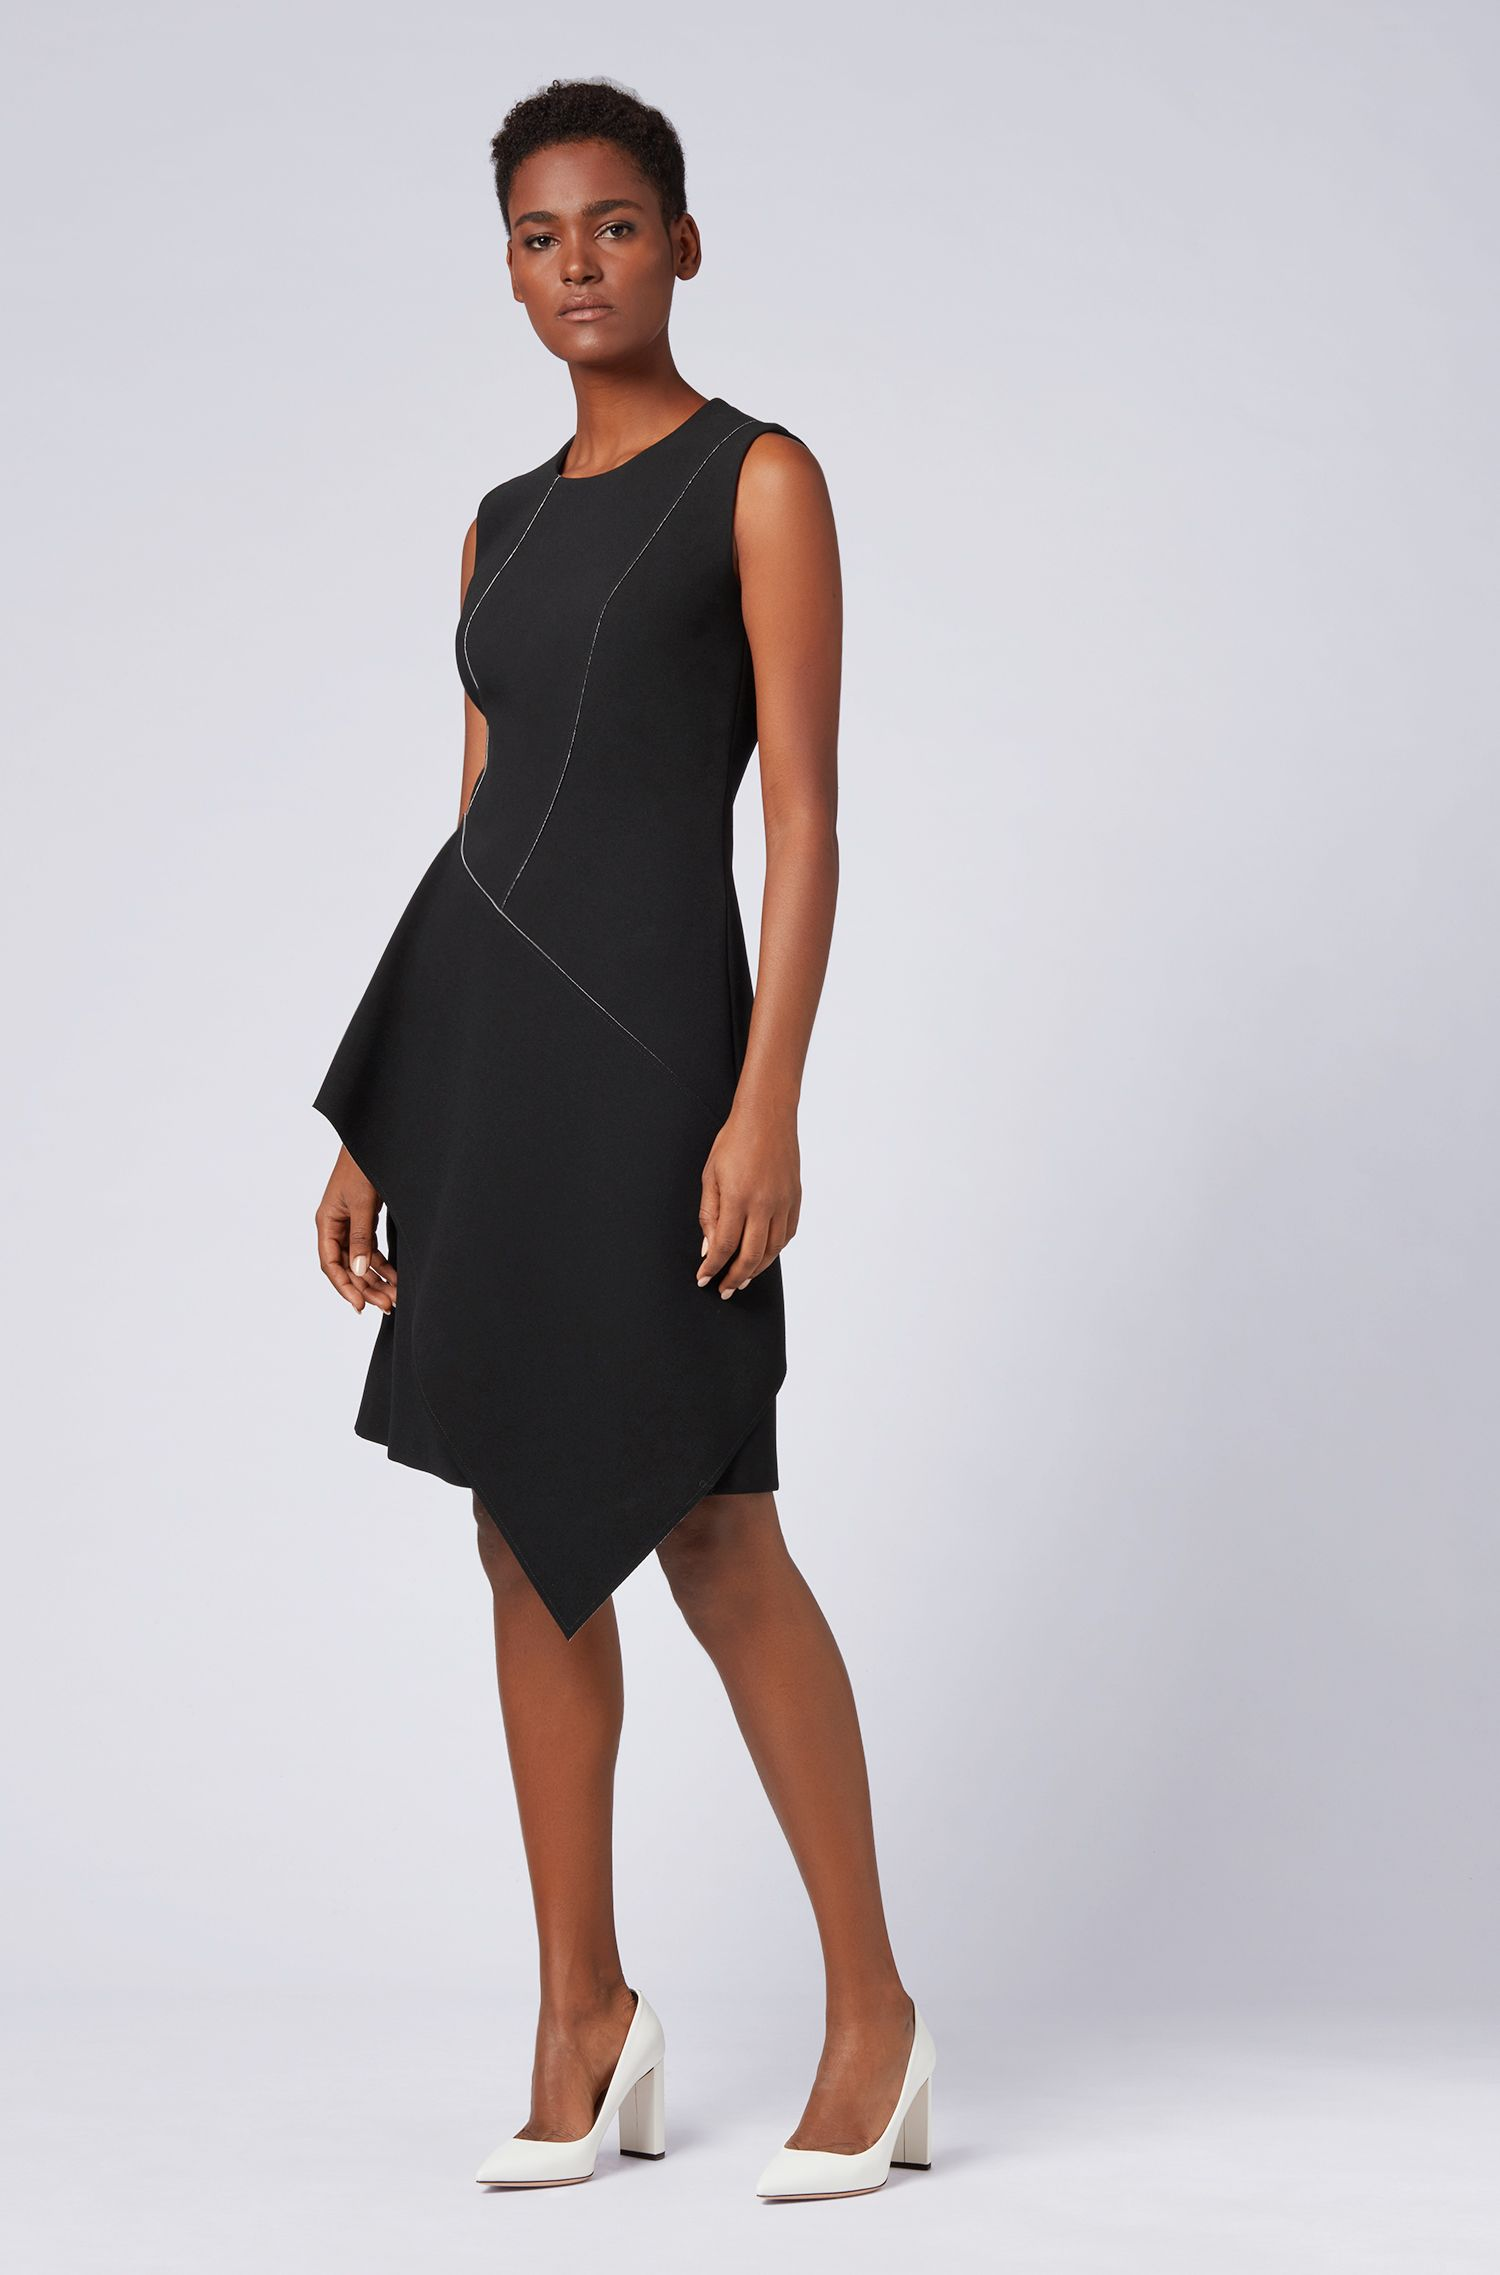 Mouwloze jurk in tweekleurige, gebonden crêpe, Bedrukt